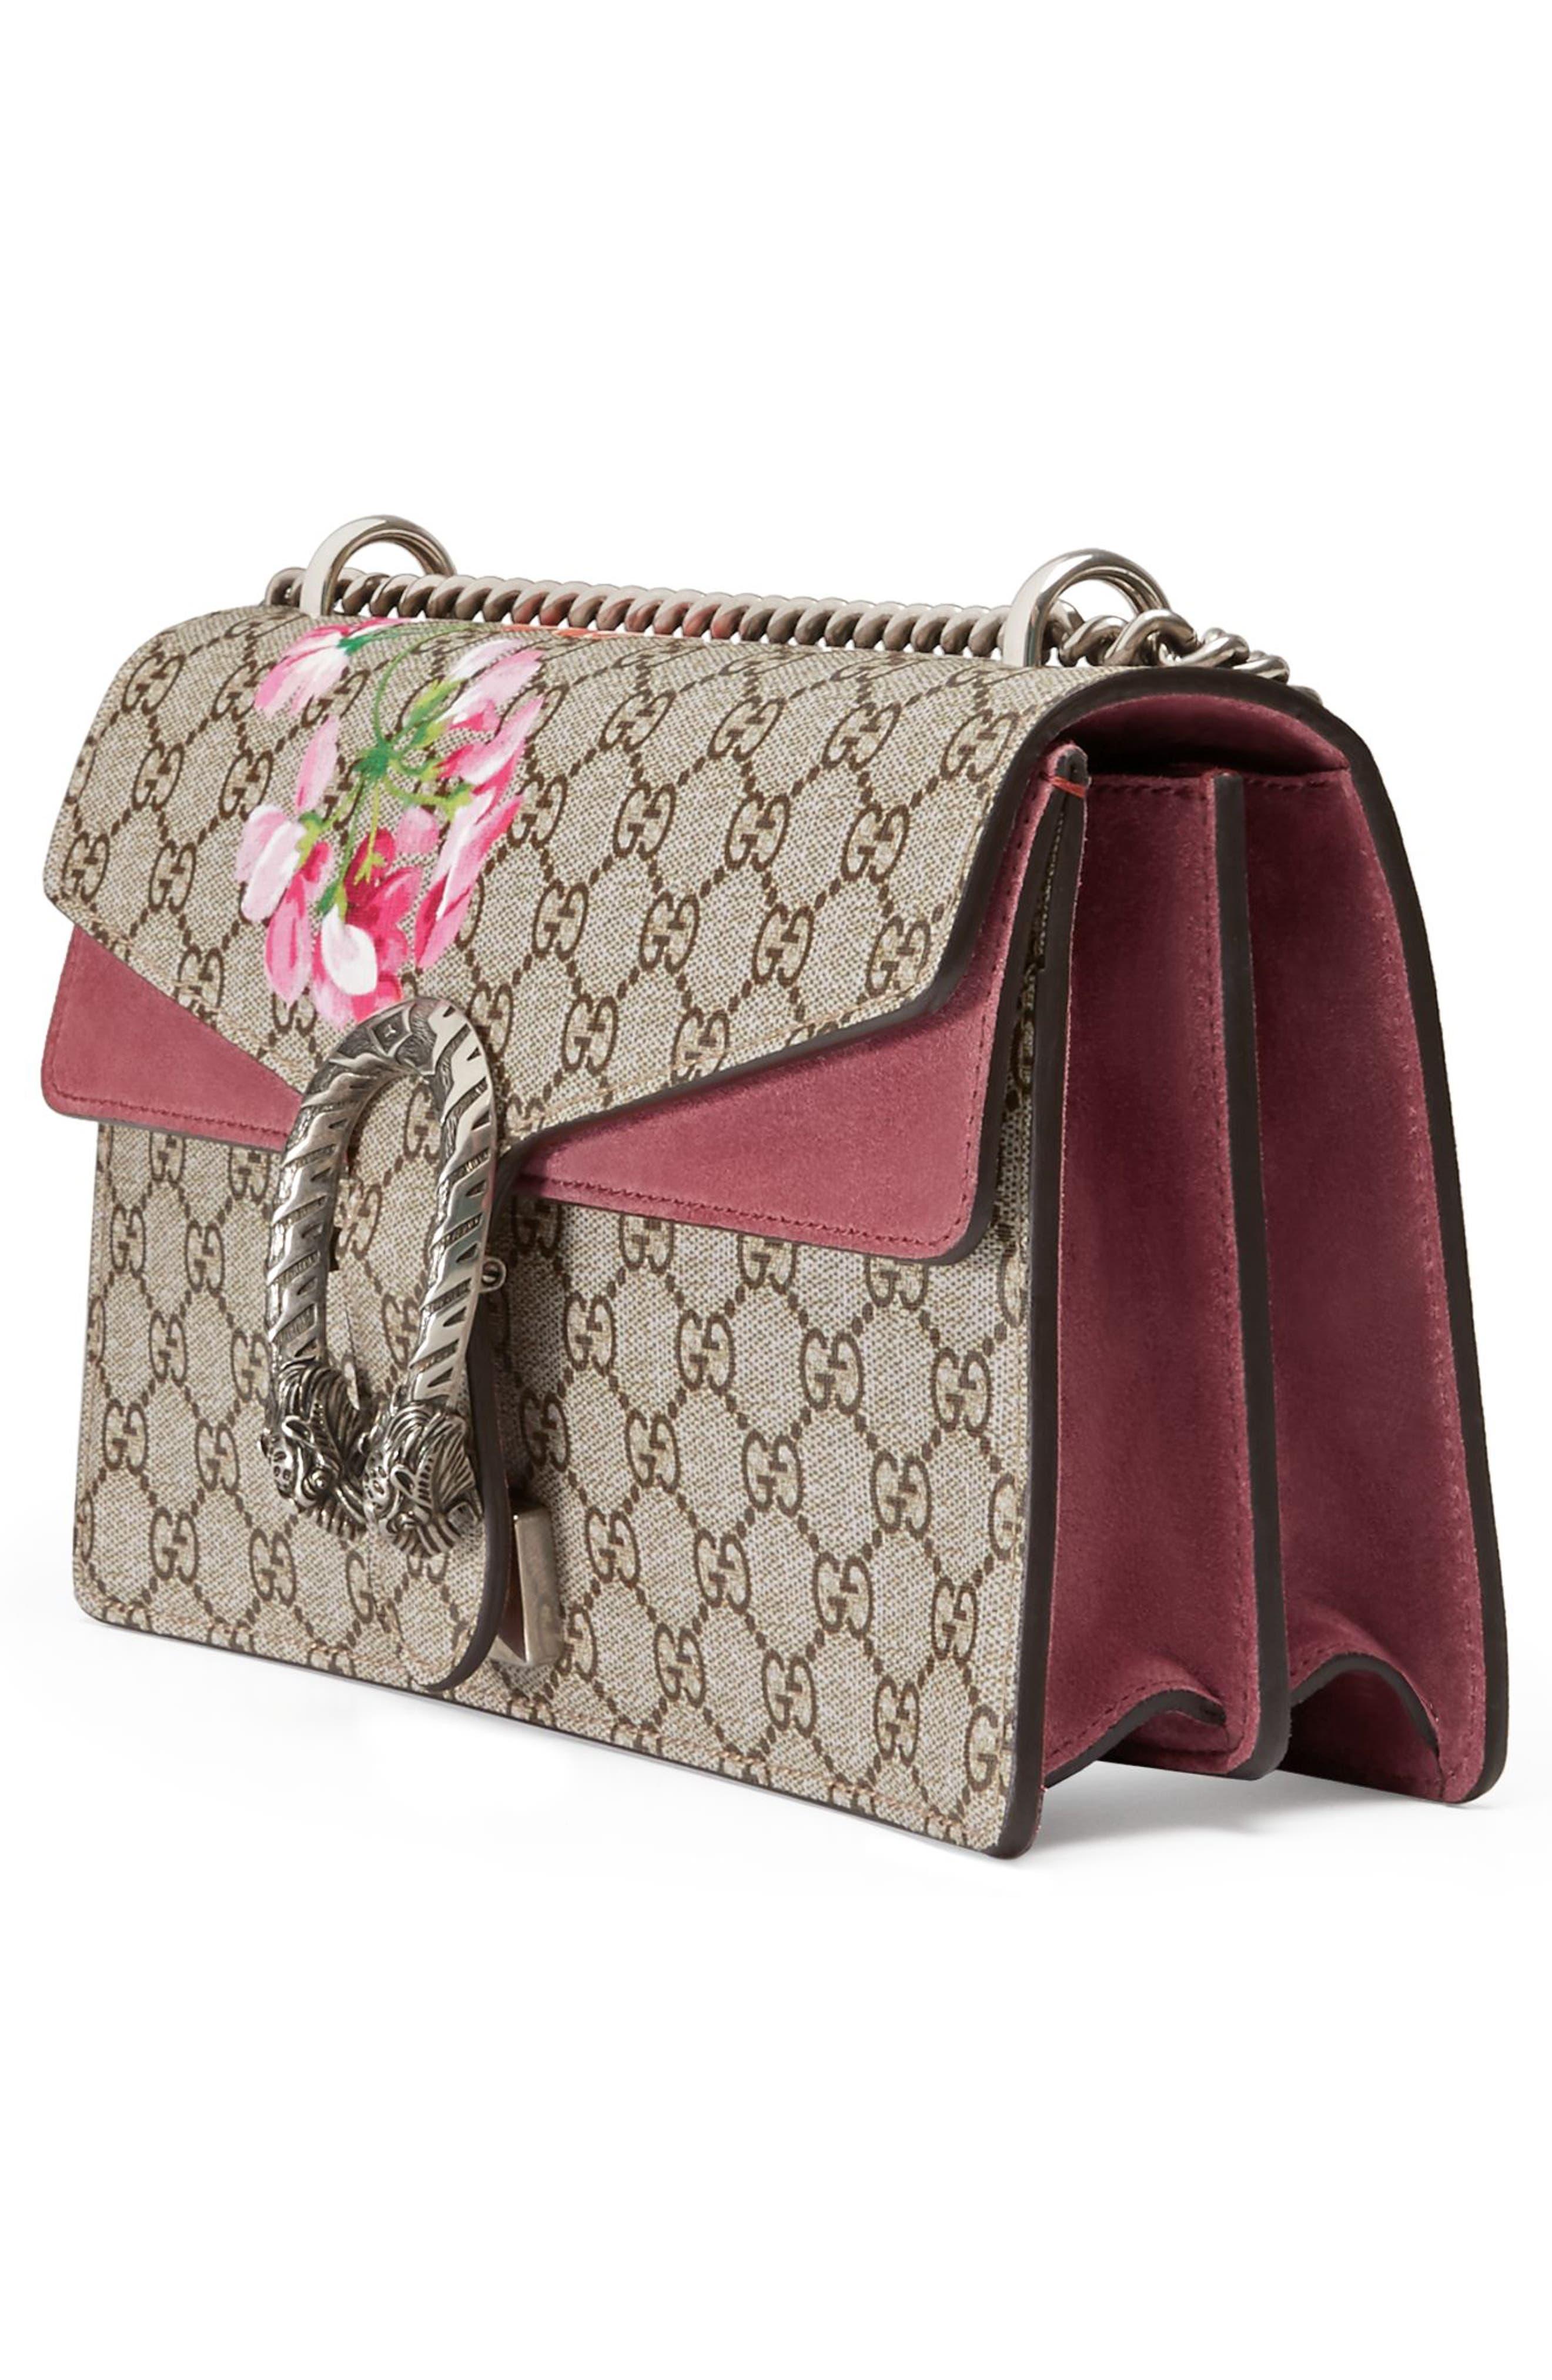 Small Dionysus Floral GG Supreme Canvas Shoulder Bag,                             Alternate thumbnail 4, color,                             Beige Ebony/ Dry Rose